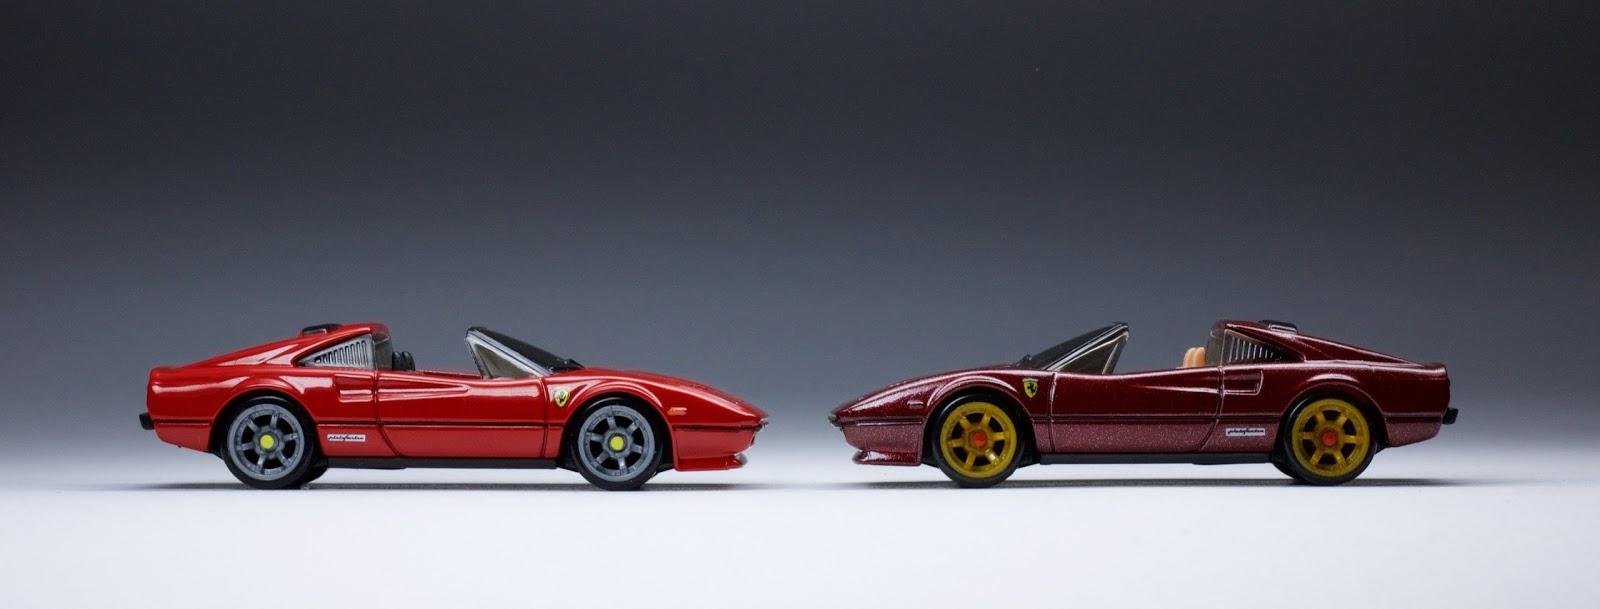 The Must Have Hot Wheels Ferraris Ferrari 308 Gts